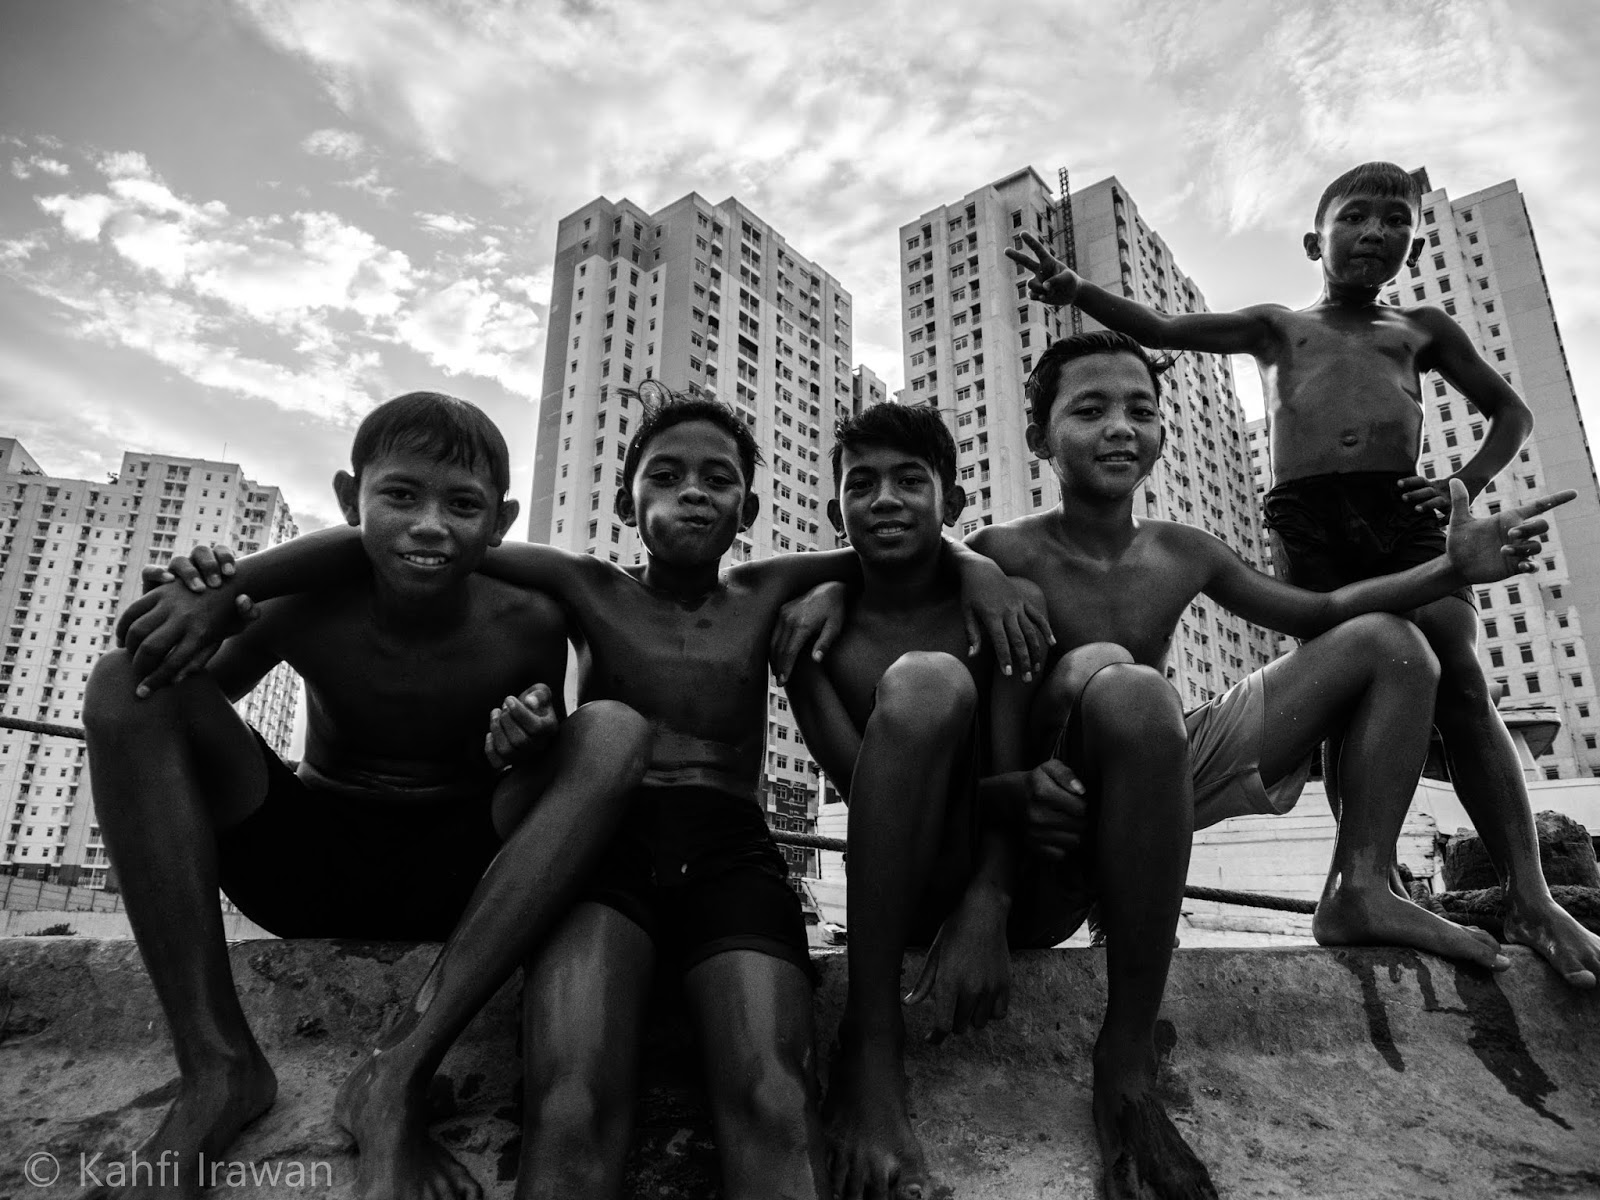 Merekam Jakarta dalam bingkai Hitam Putih